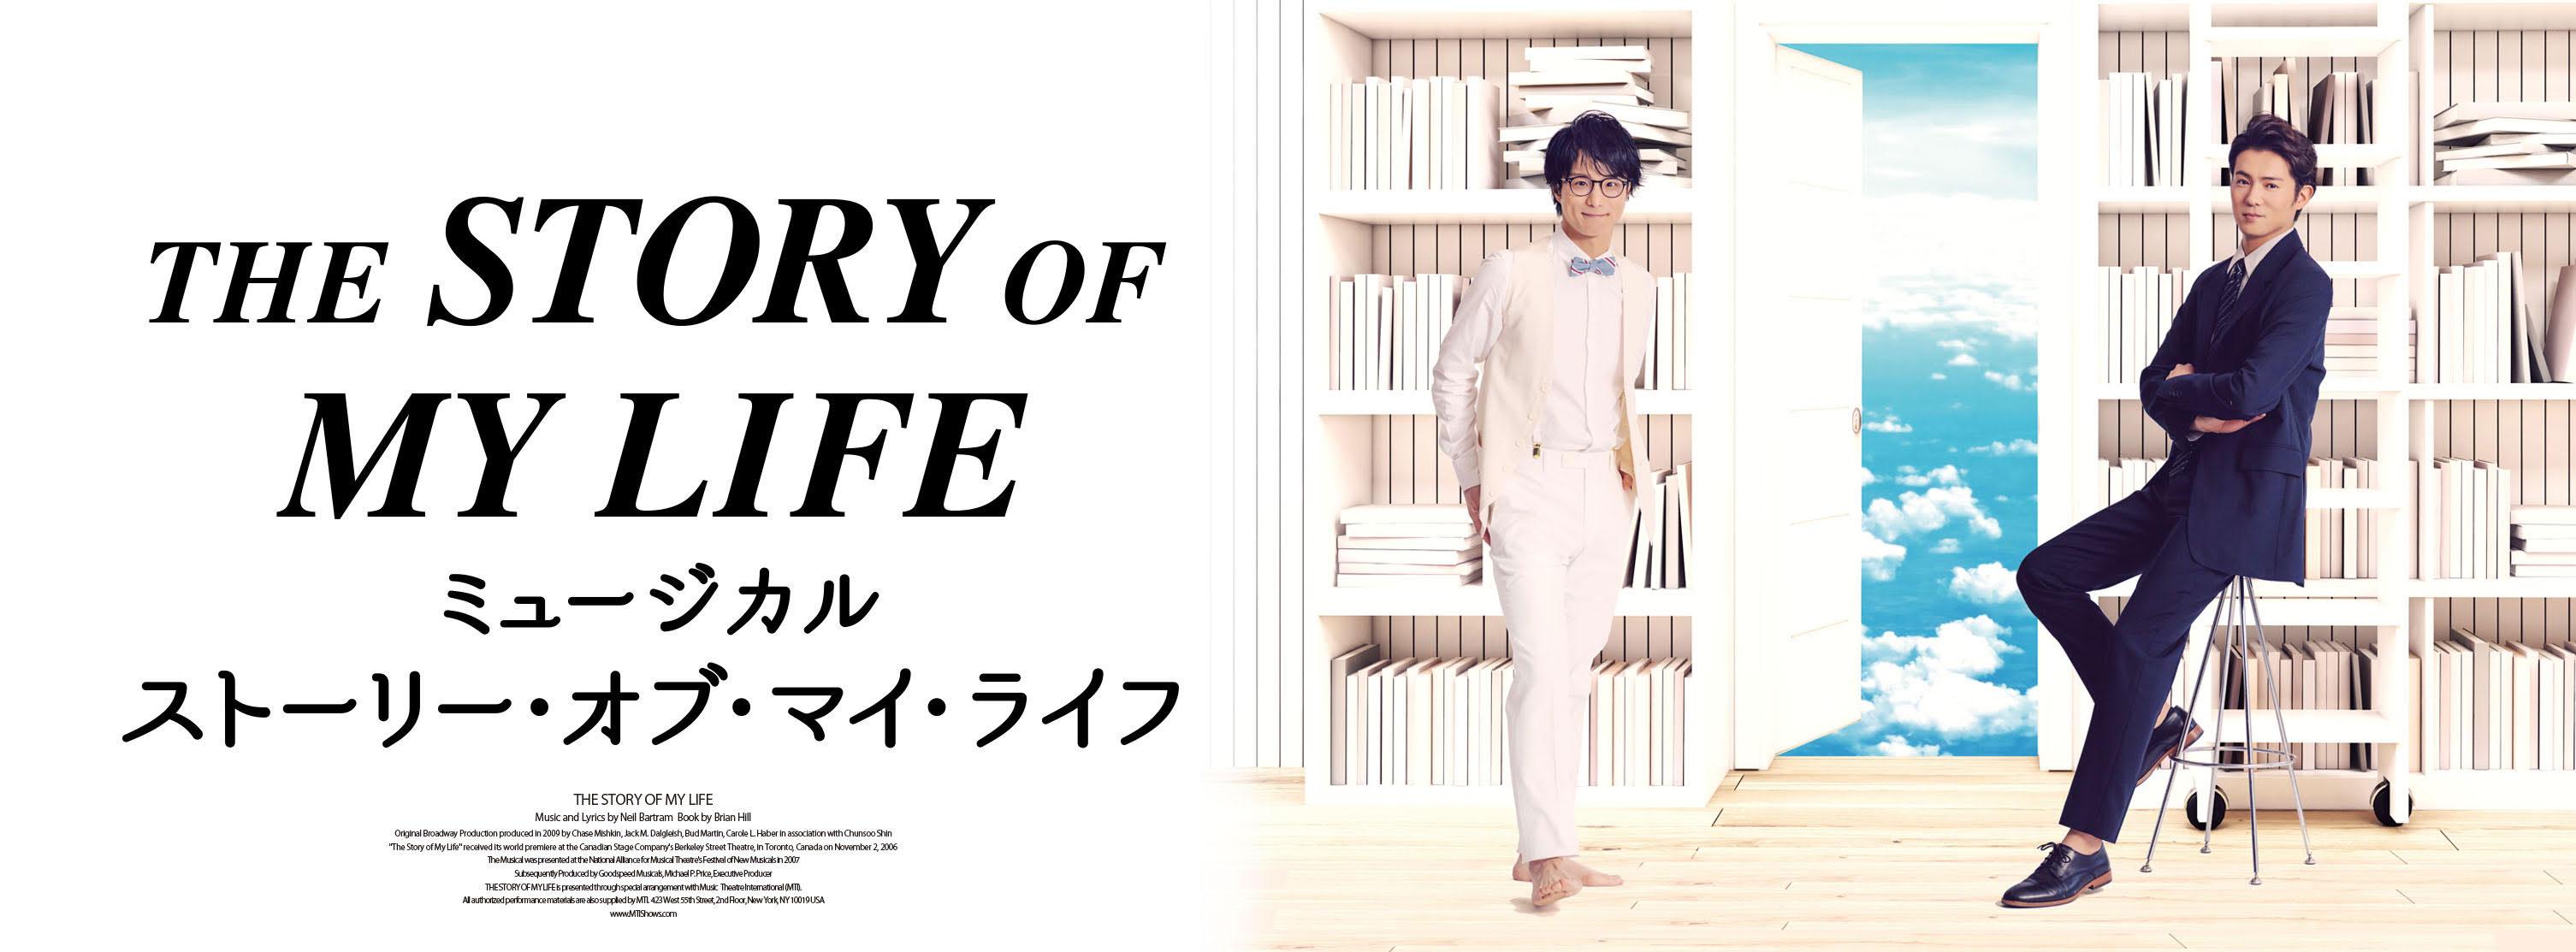 THE STORY OF MY LIFE ミュージカル「ストーリー・オブ・マイ・ライフ」